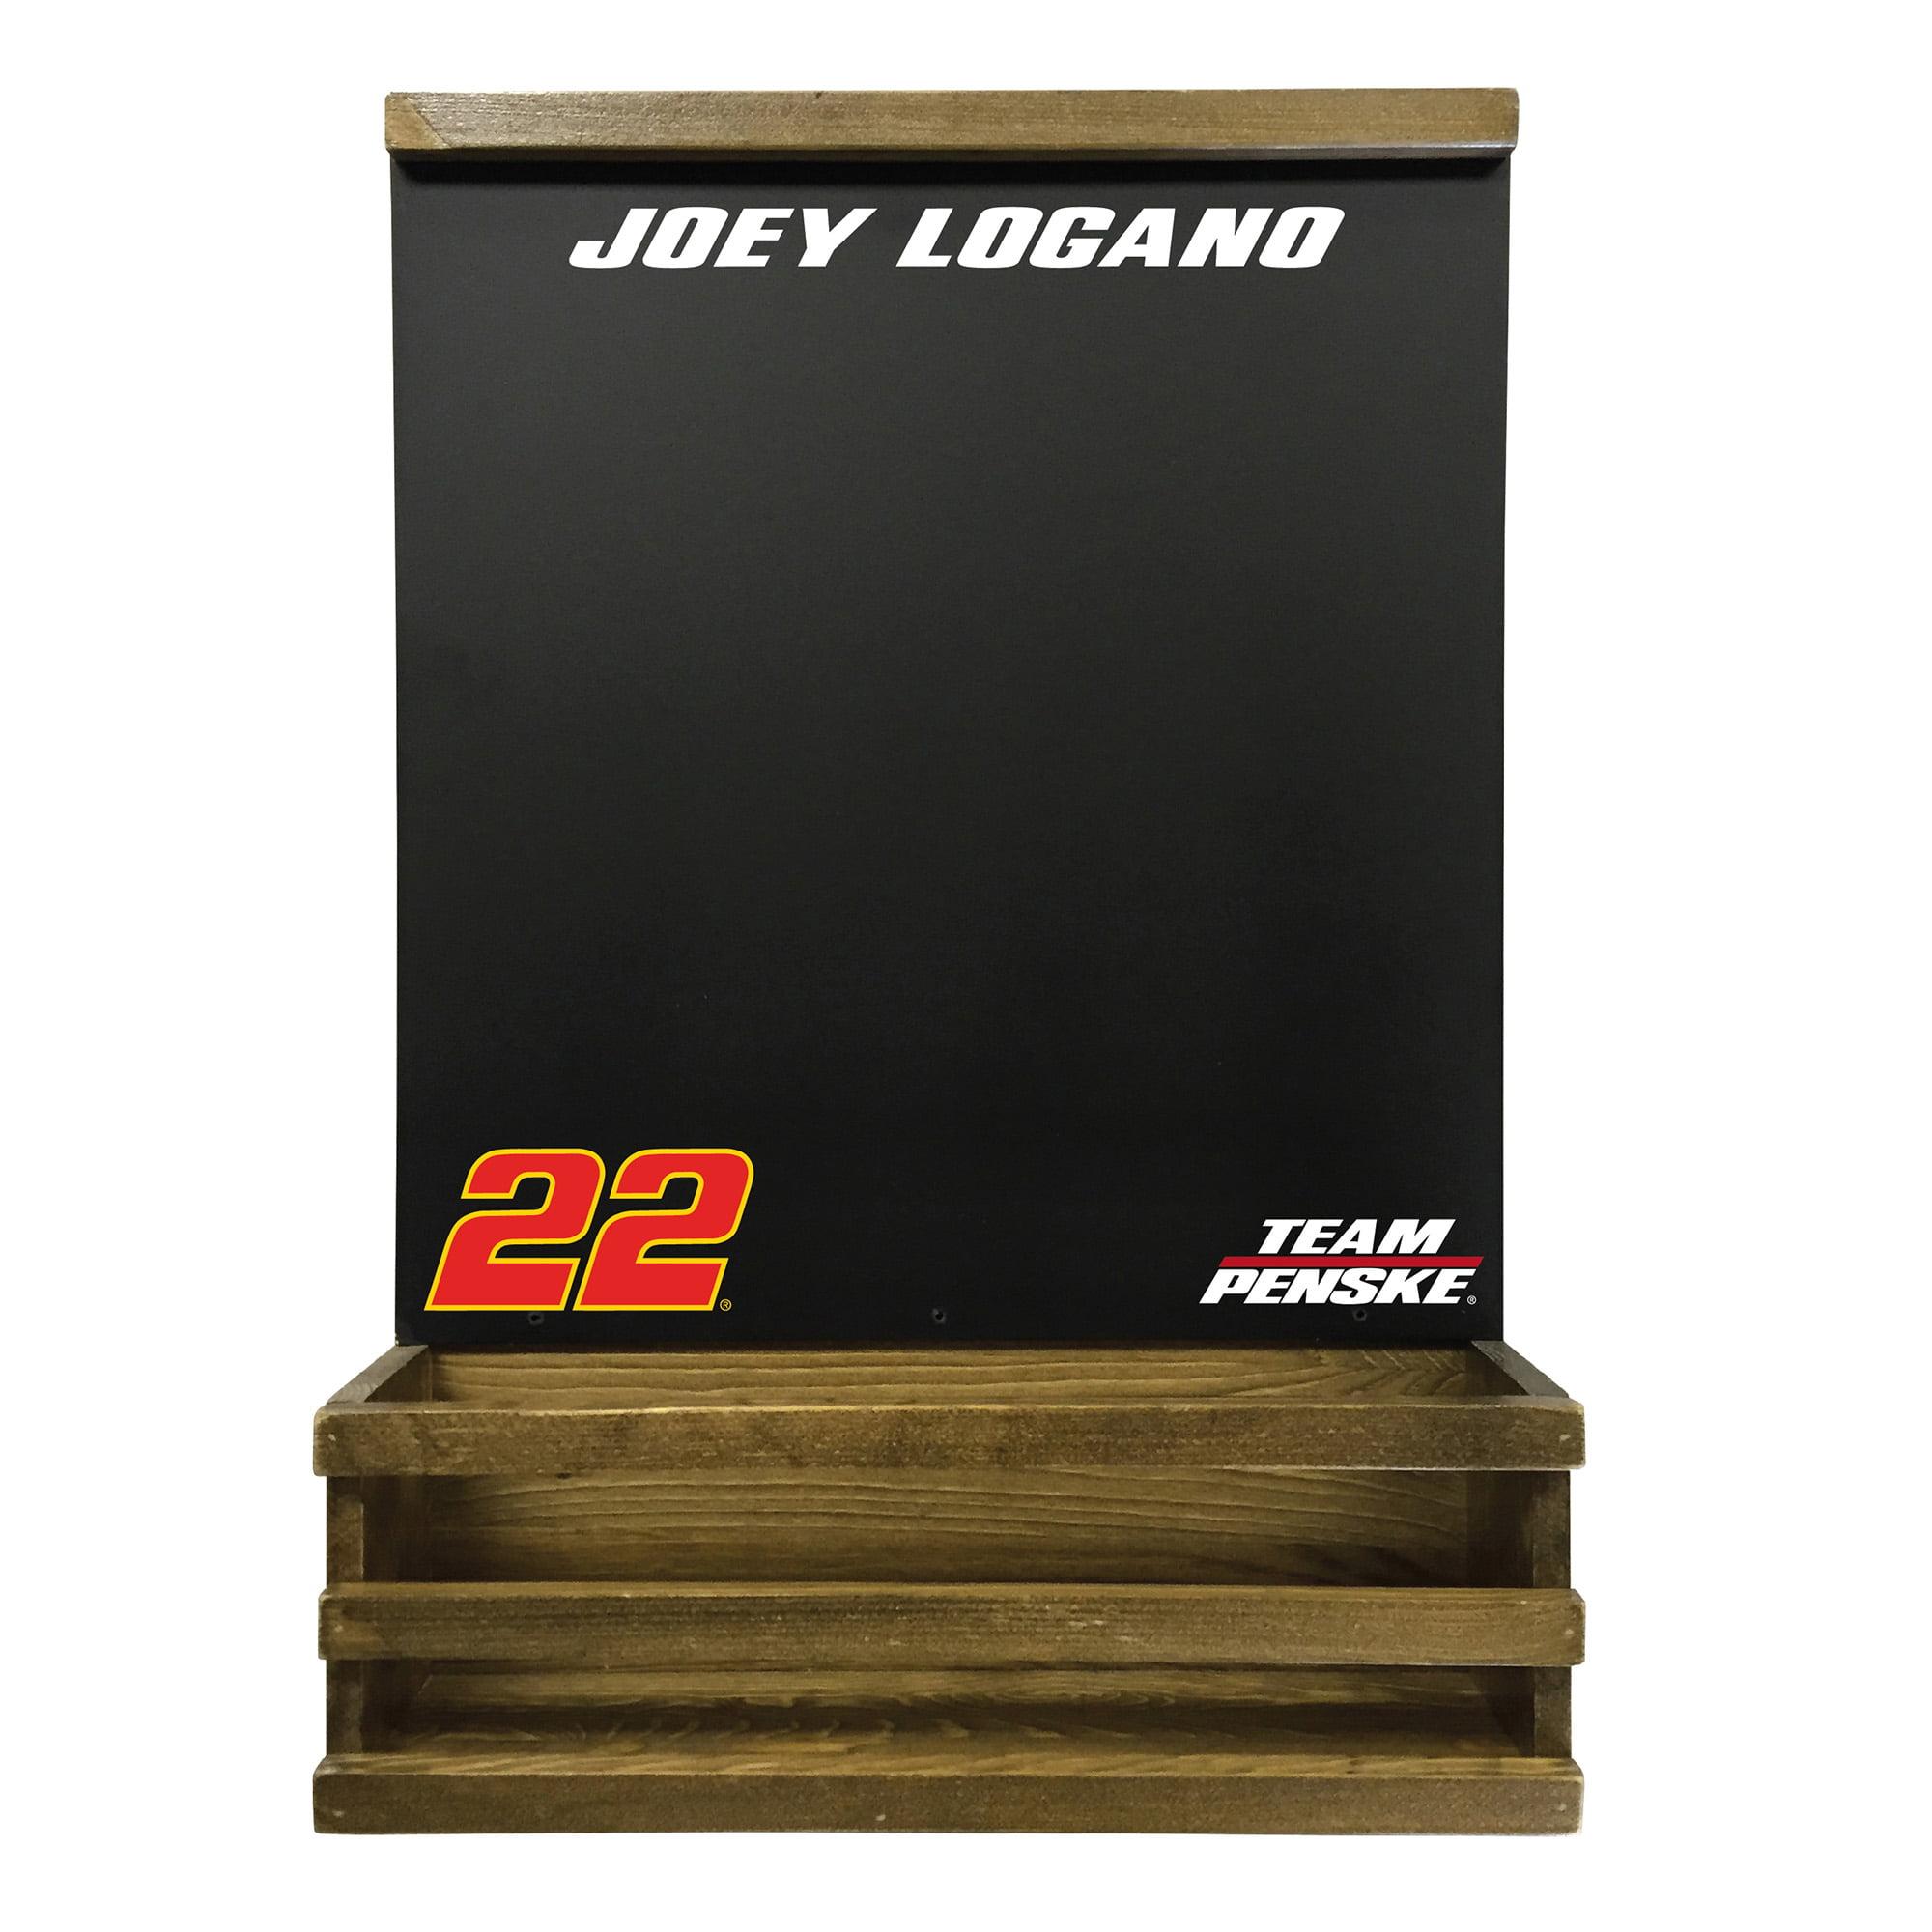 Joey Logano Hanging Chalkboard - No Size